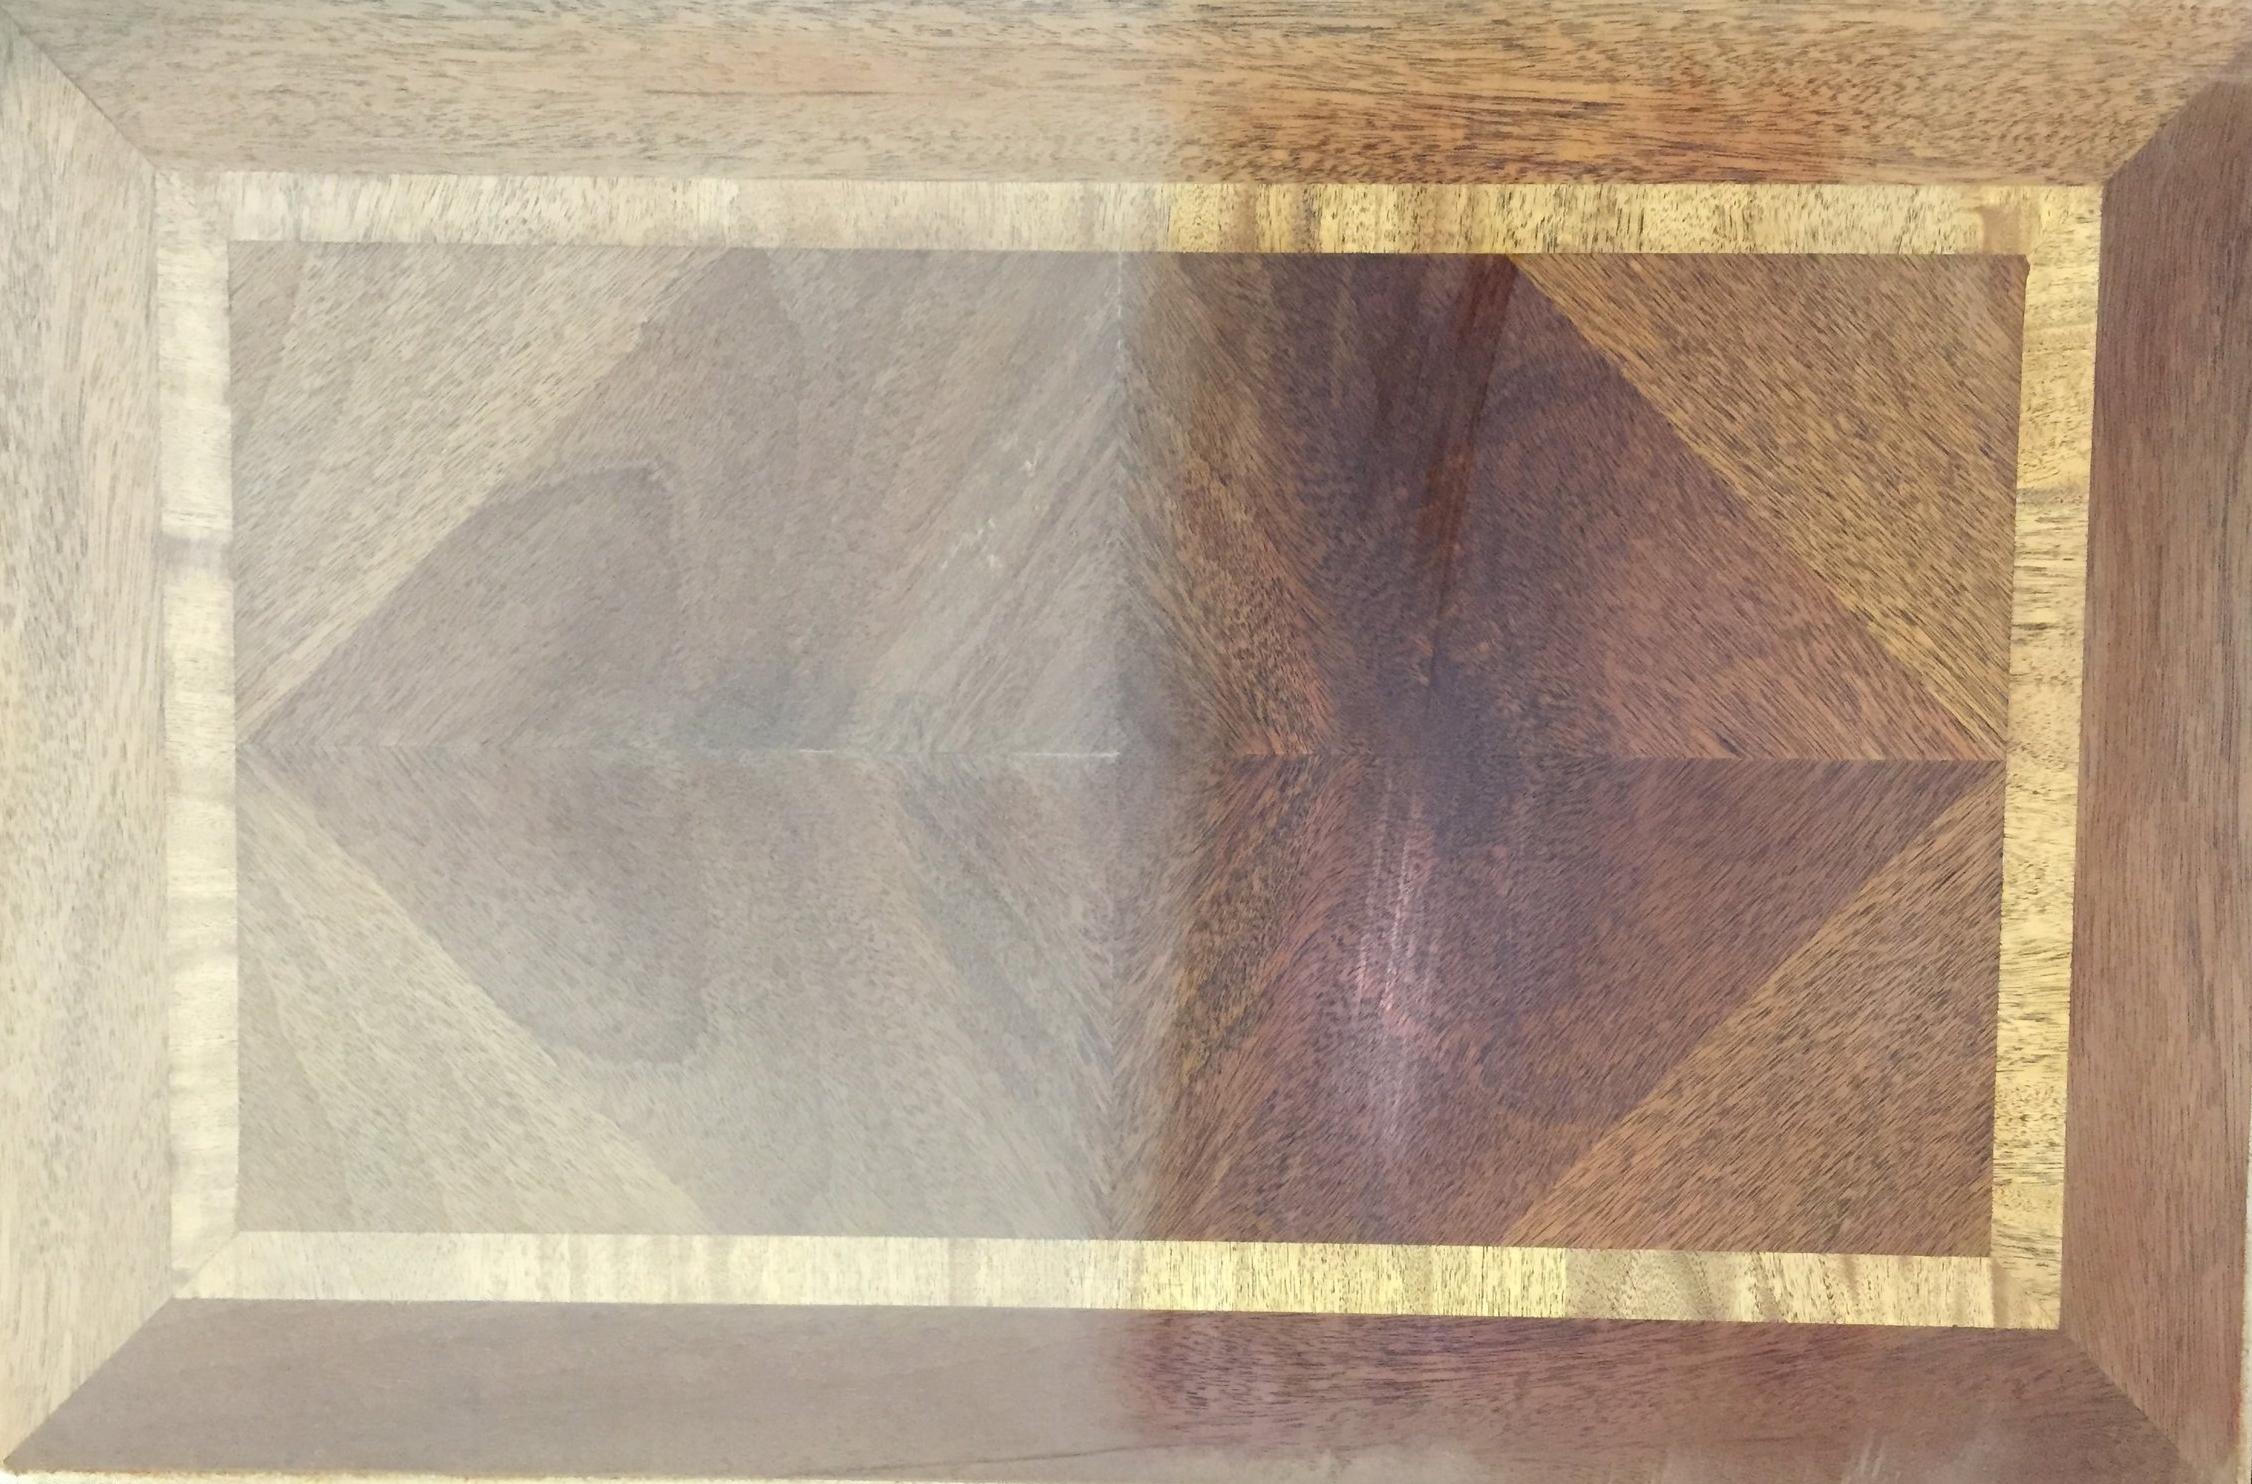 Mahogany Side Table - Sanded Thinner.JPG